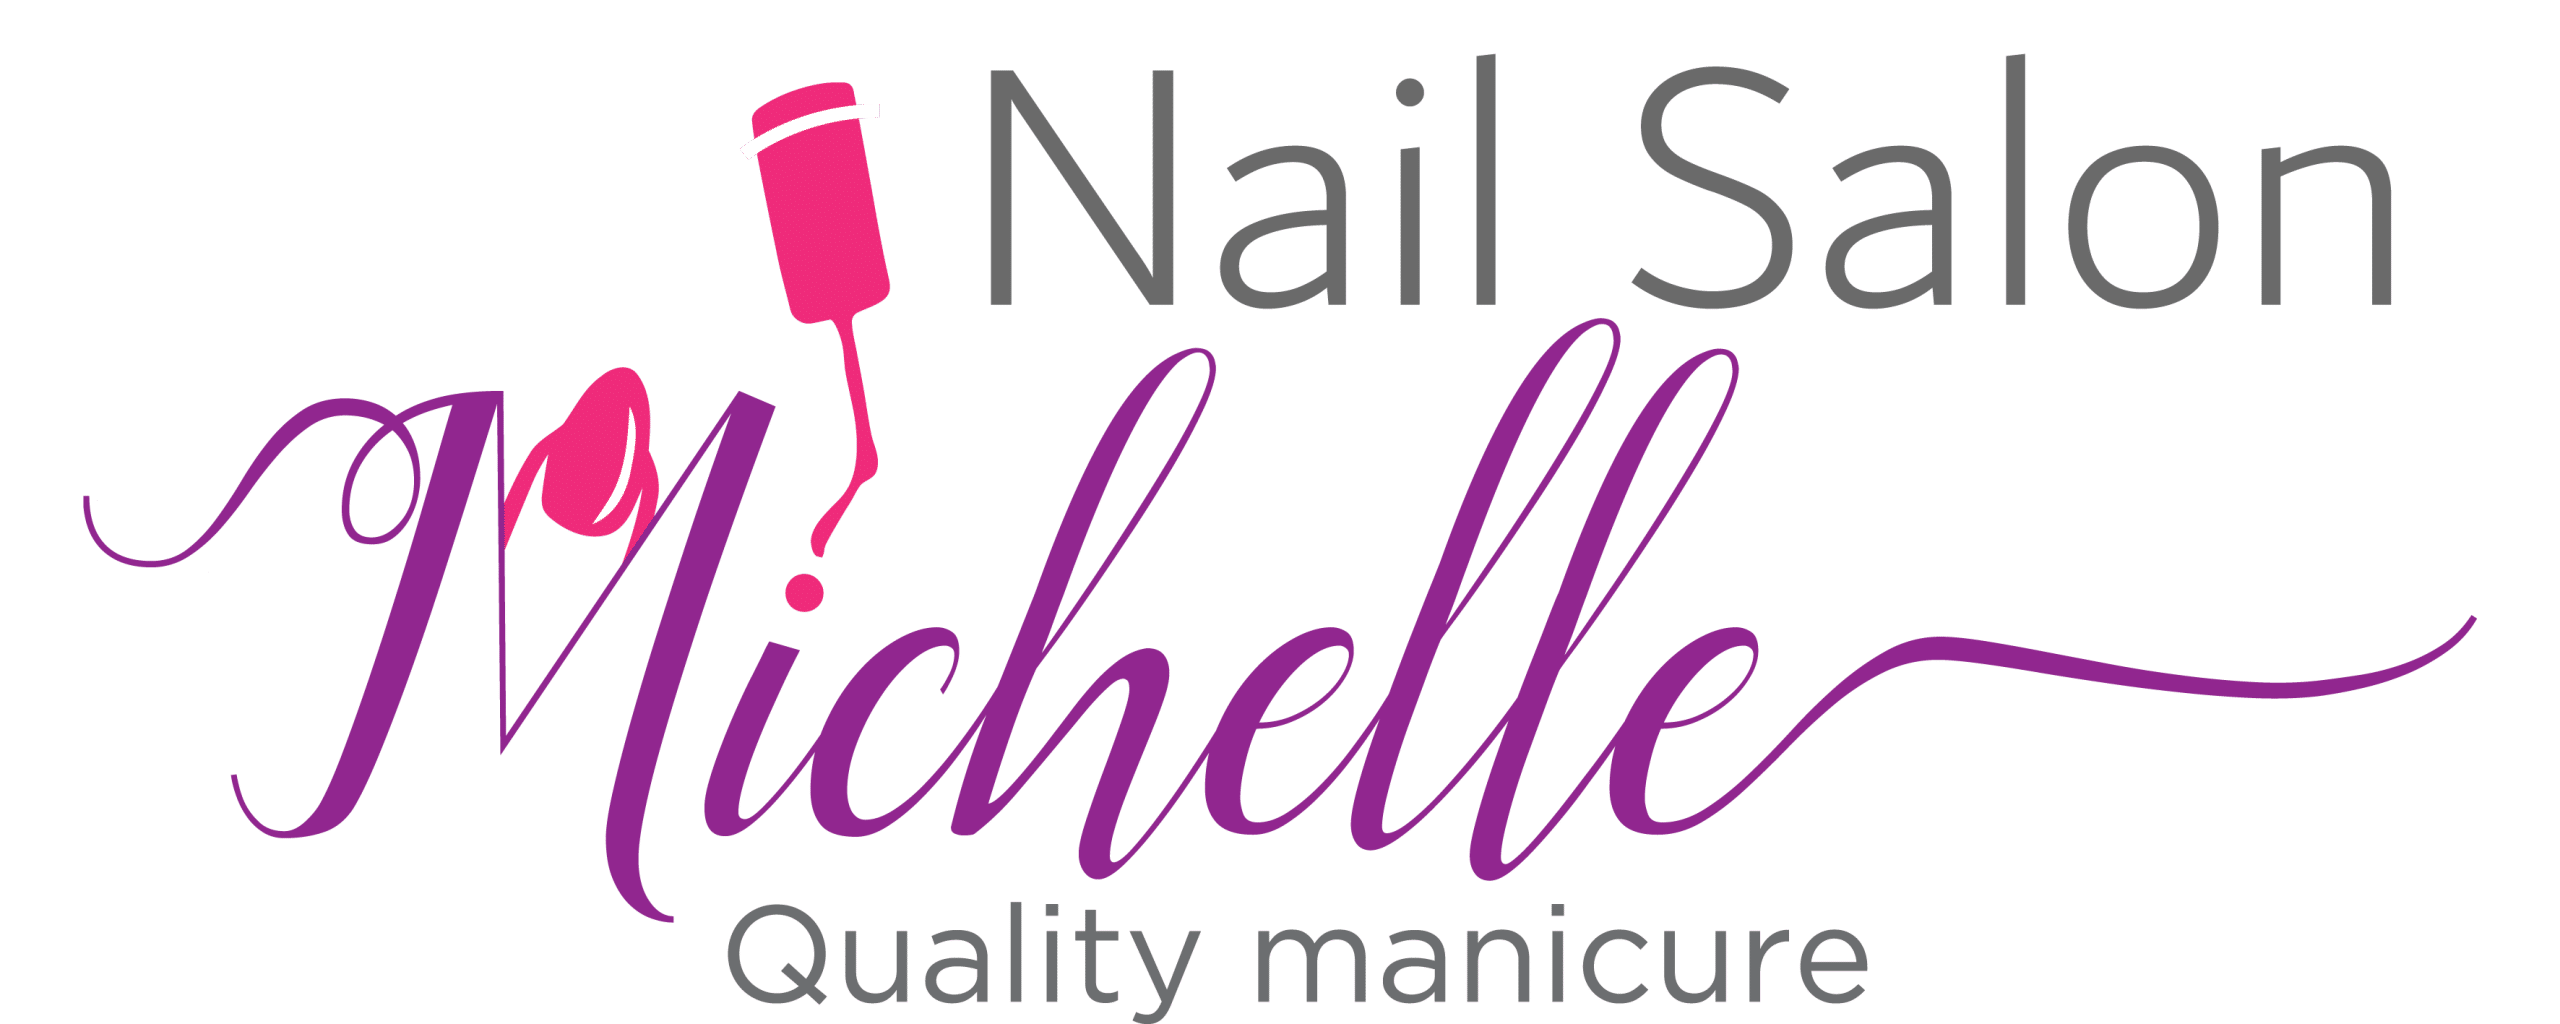 1 Quality Nail Salon Michelle In Houtwijk Den Haag Nl